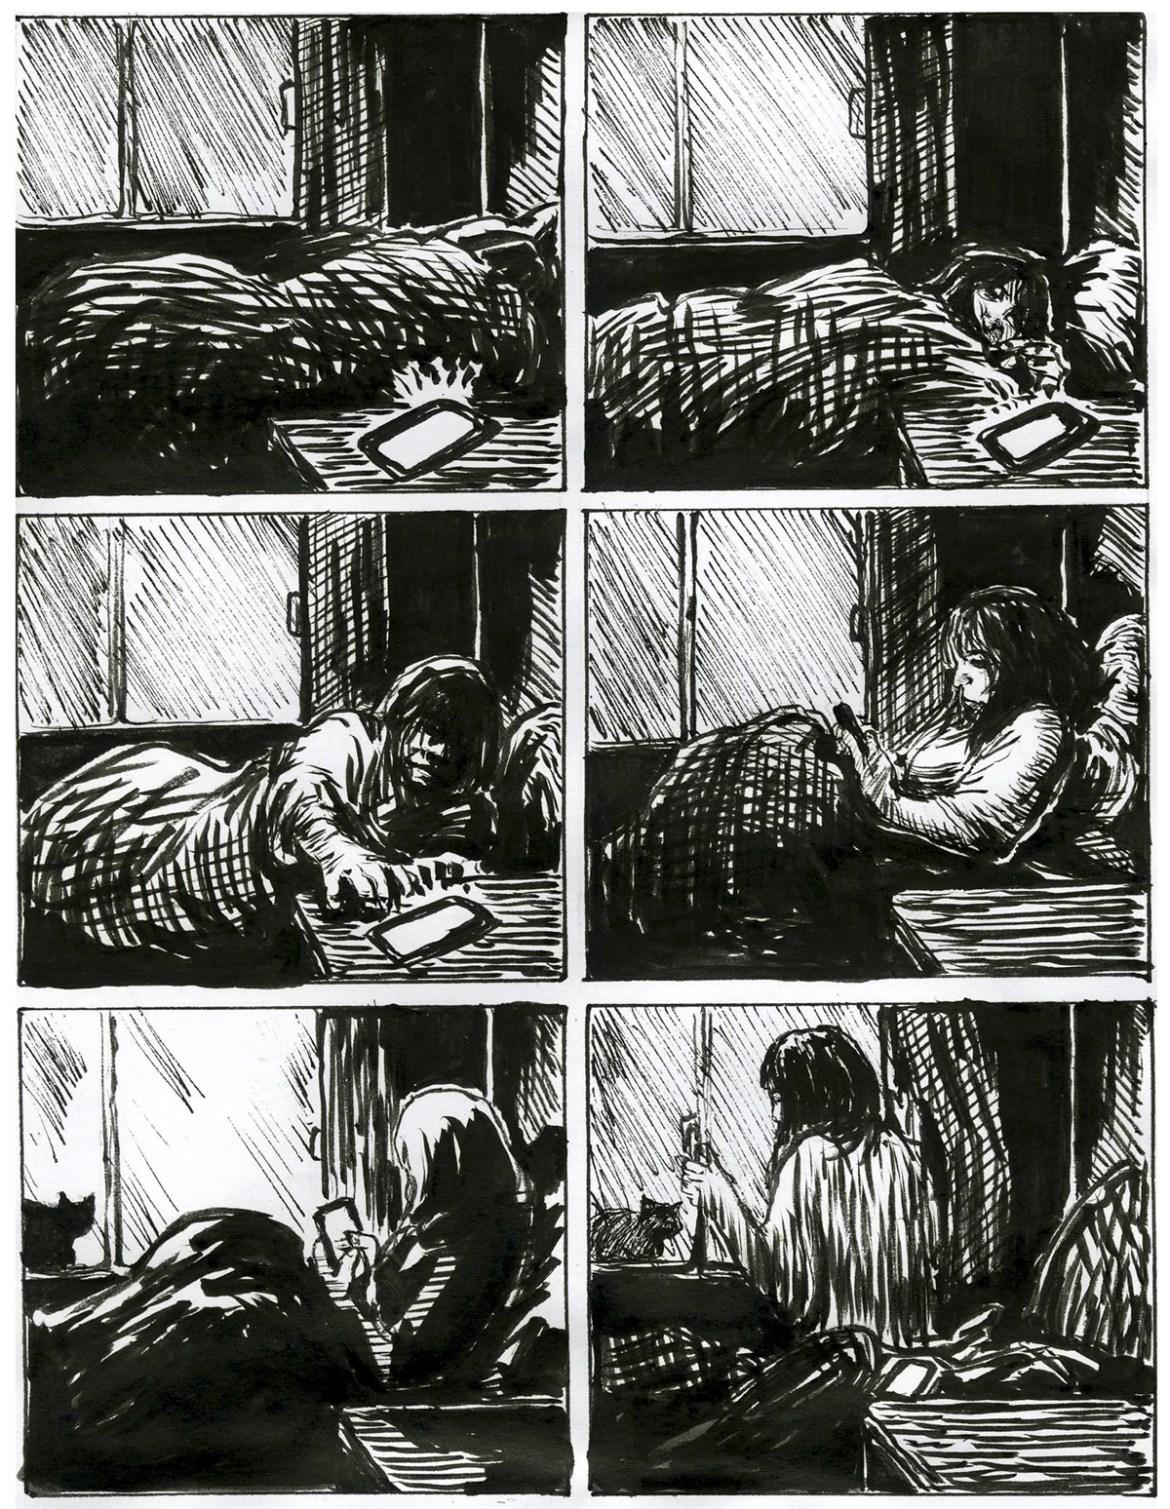 insomniotres4